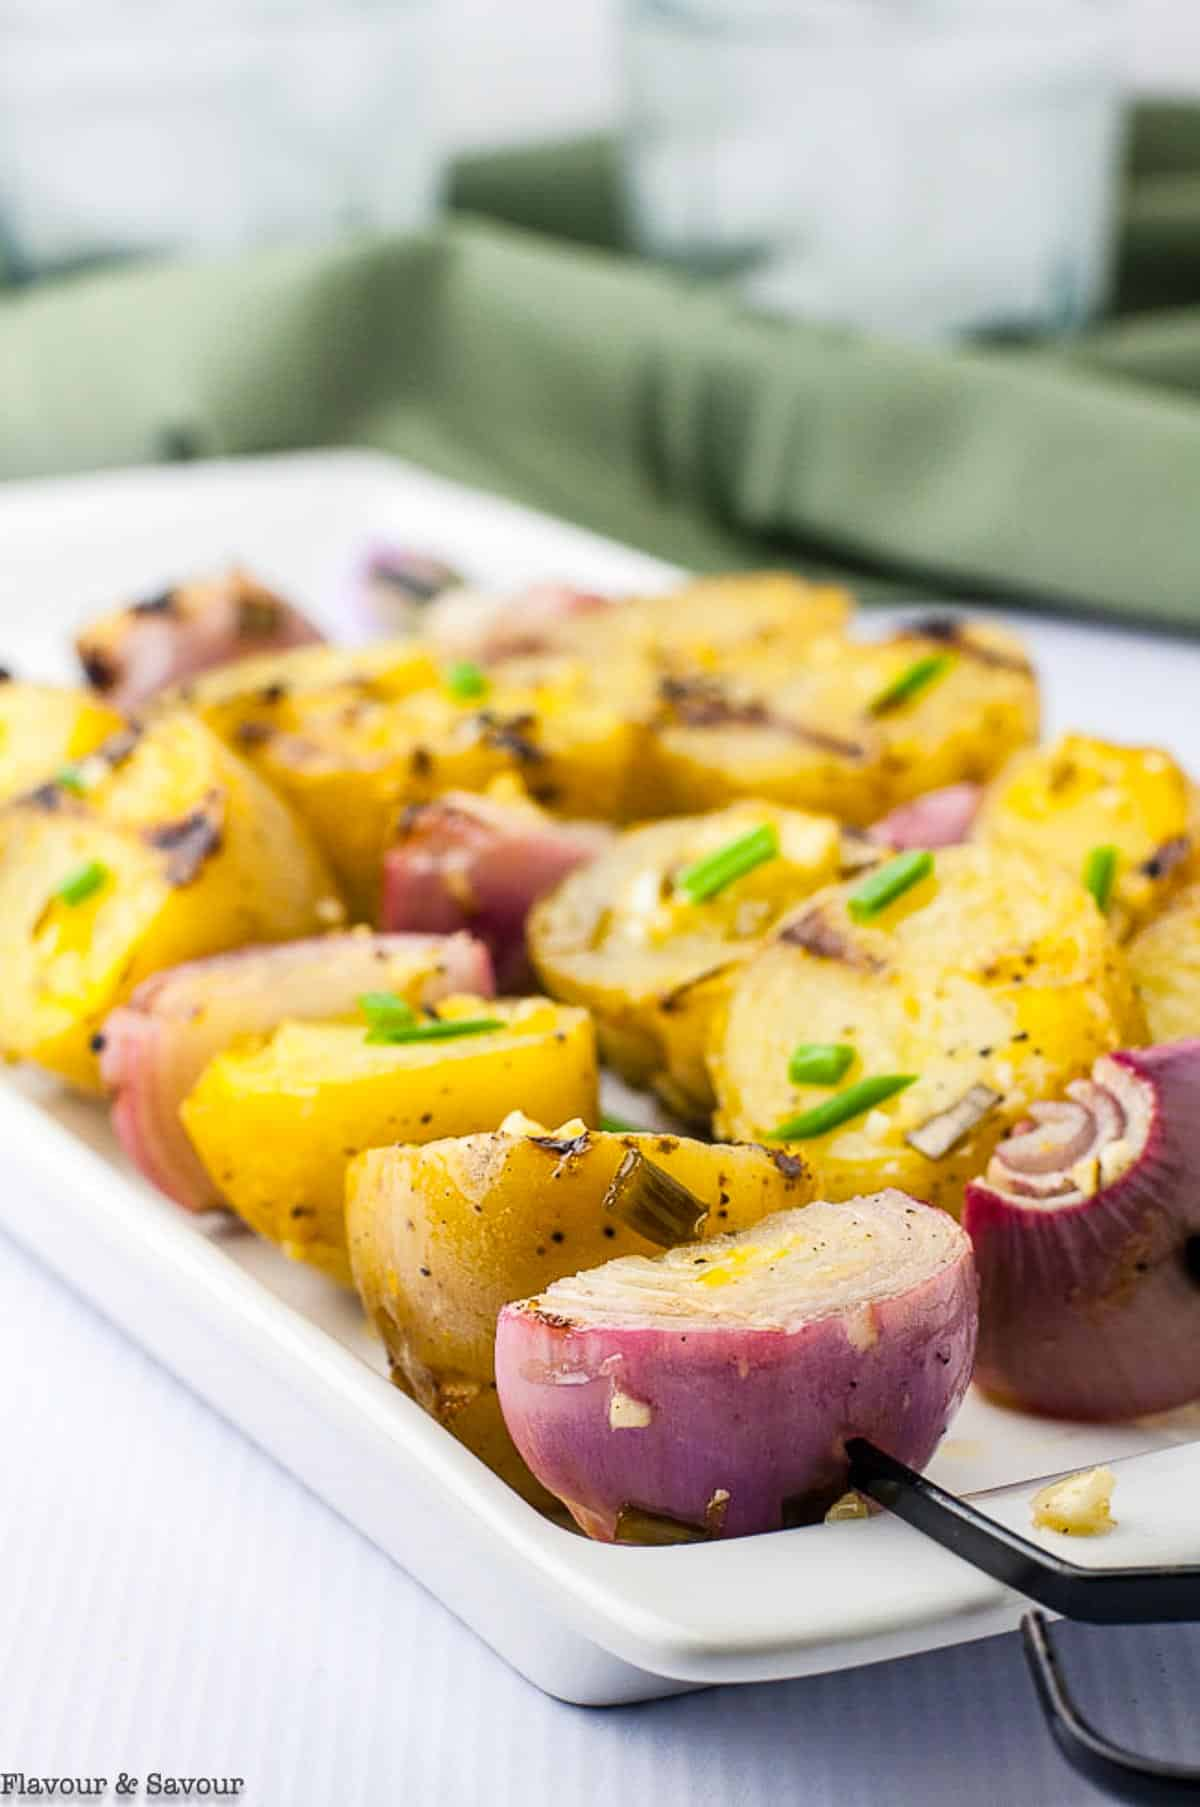 Potato Kabobs skewered with shallots